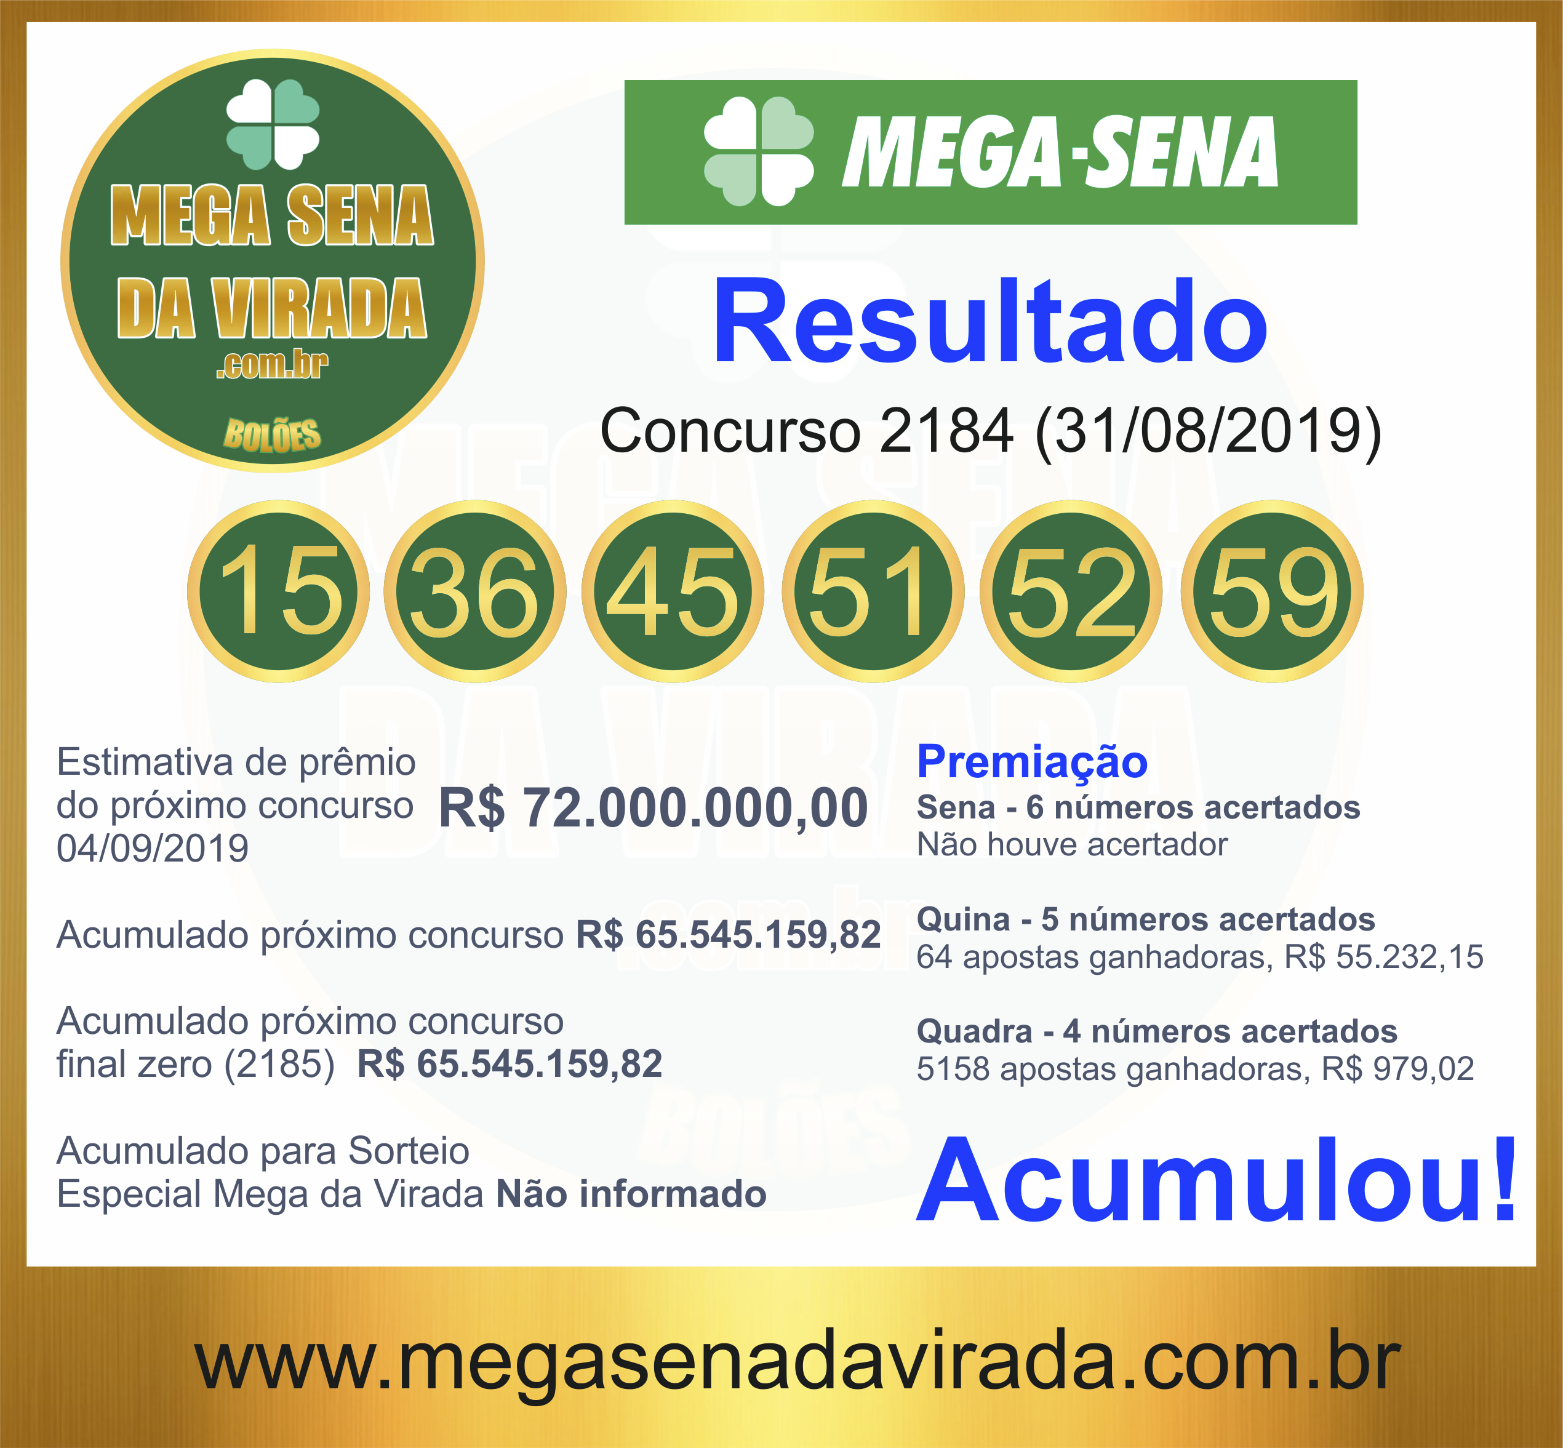 Mega Sena Concurso 2184 28/08/2019